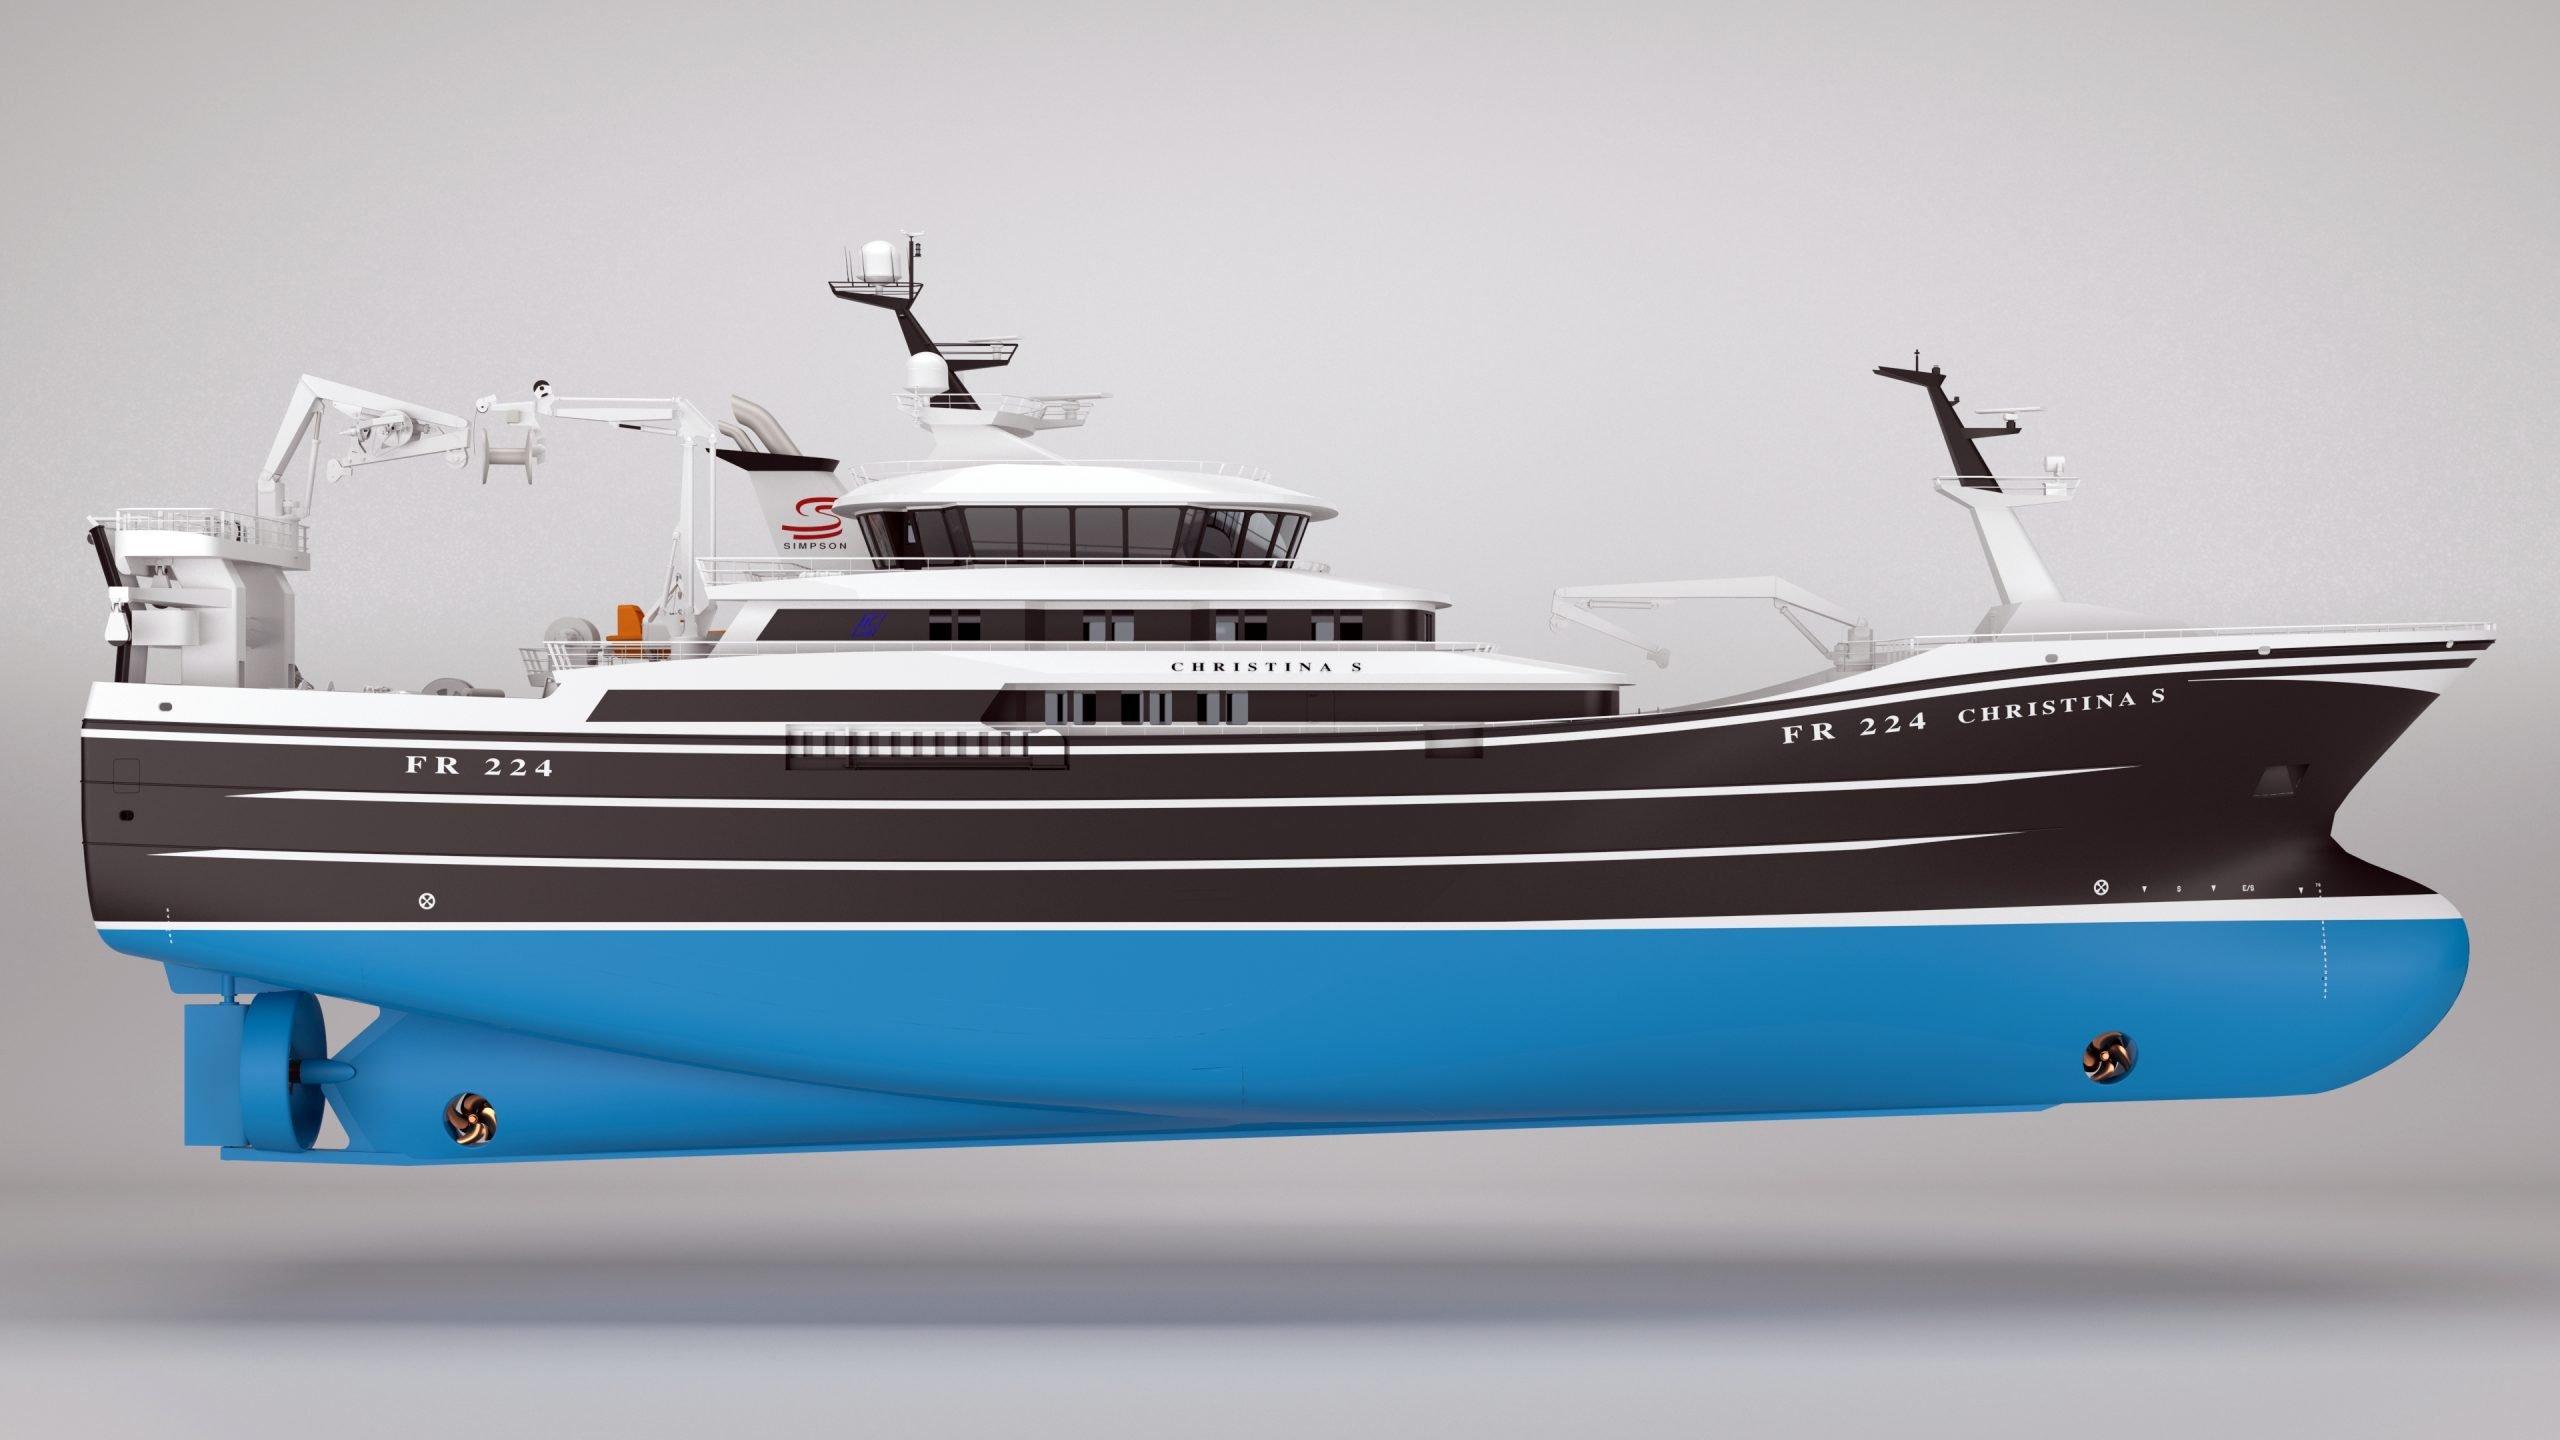 karstensens pelagic trawler